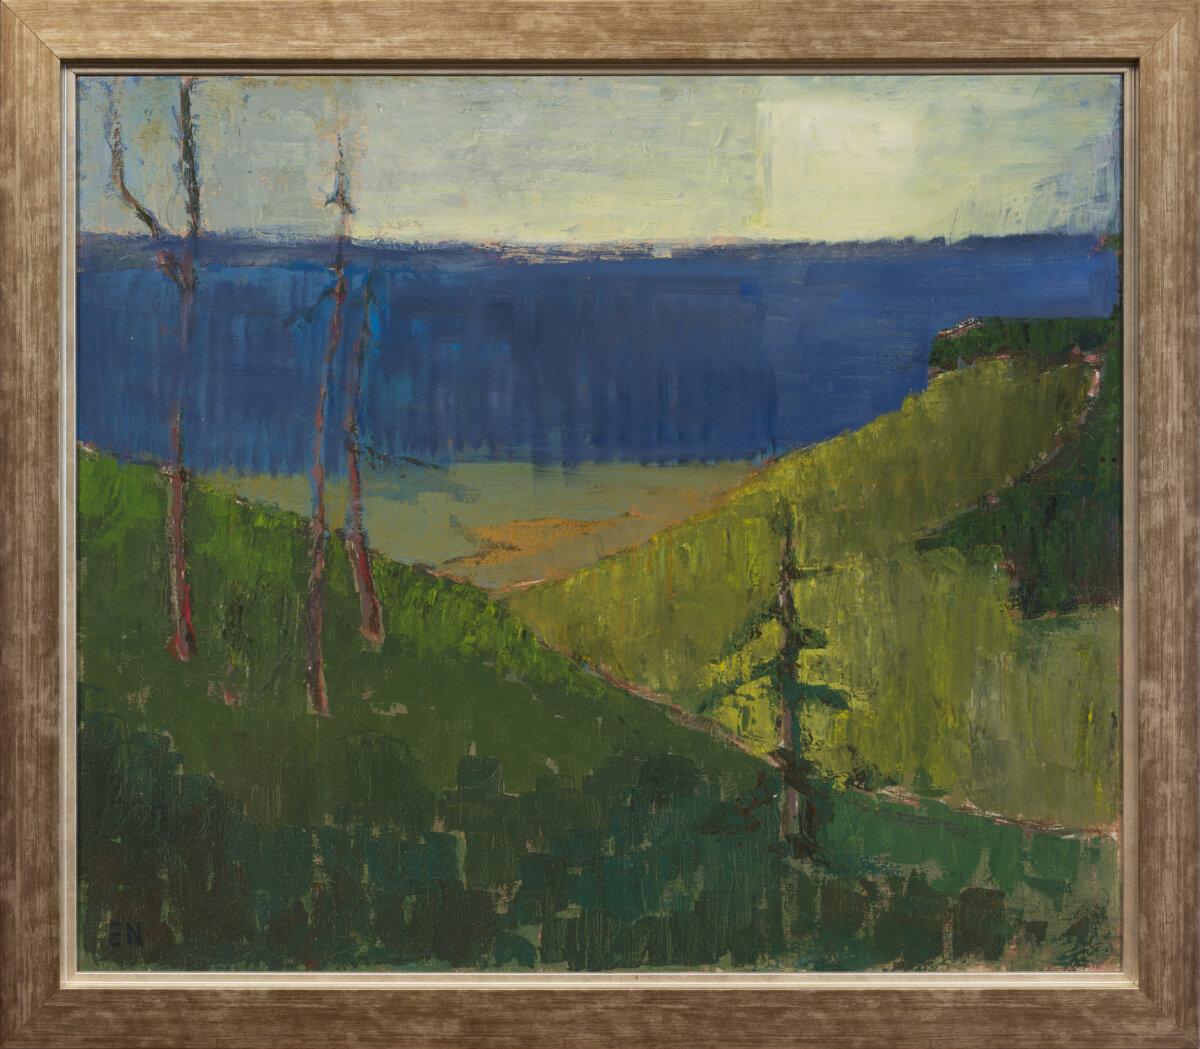 Eugenie-Noormägi-Hansen-Vaade-merele